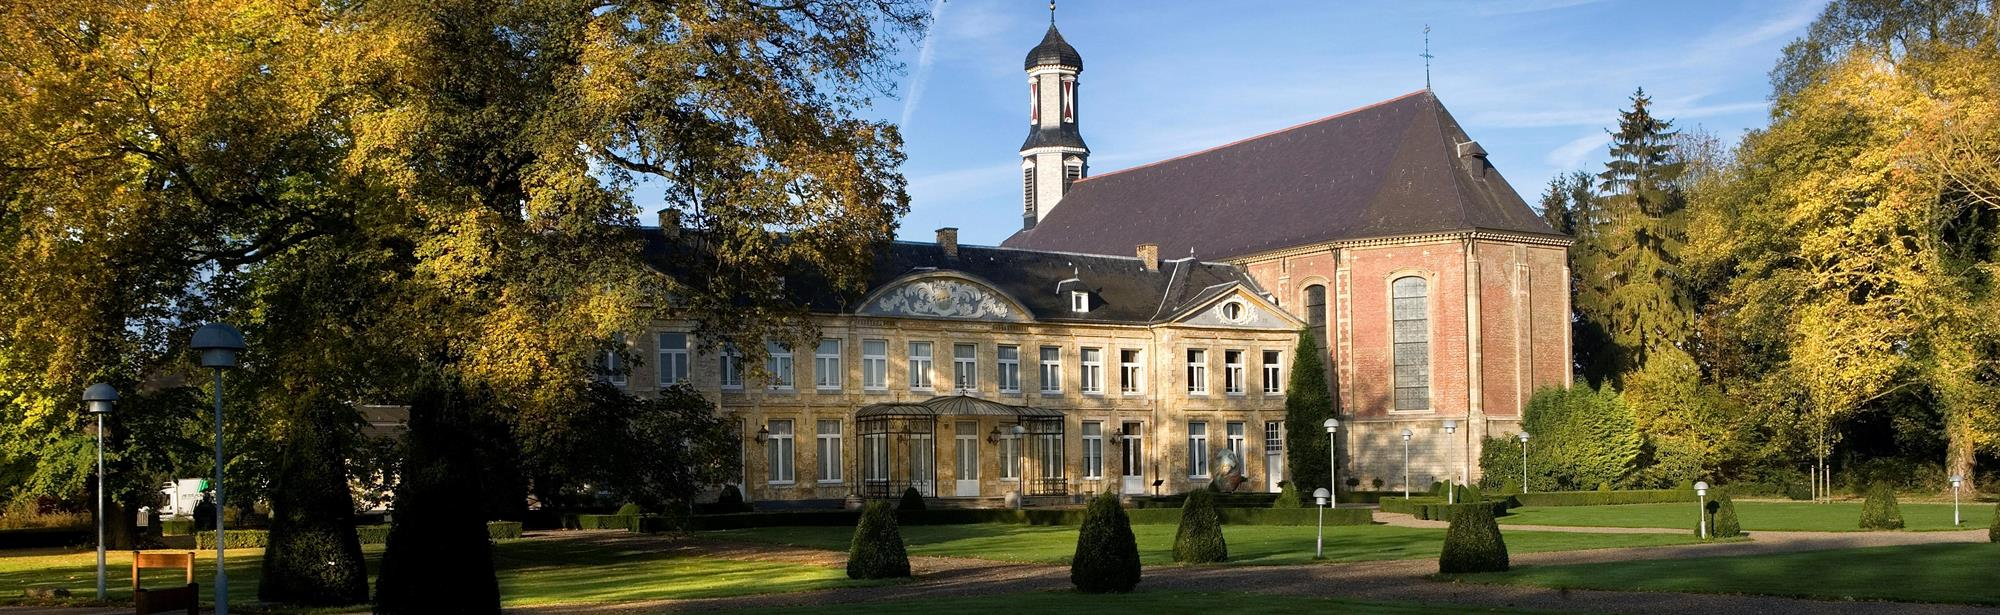 Kasteel Sint Gerlach